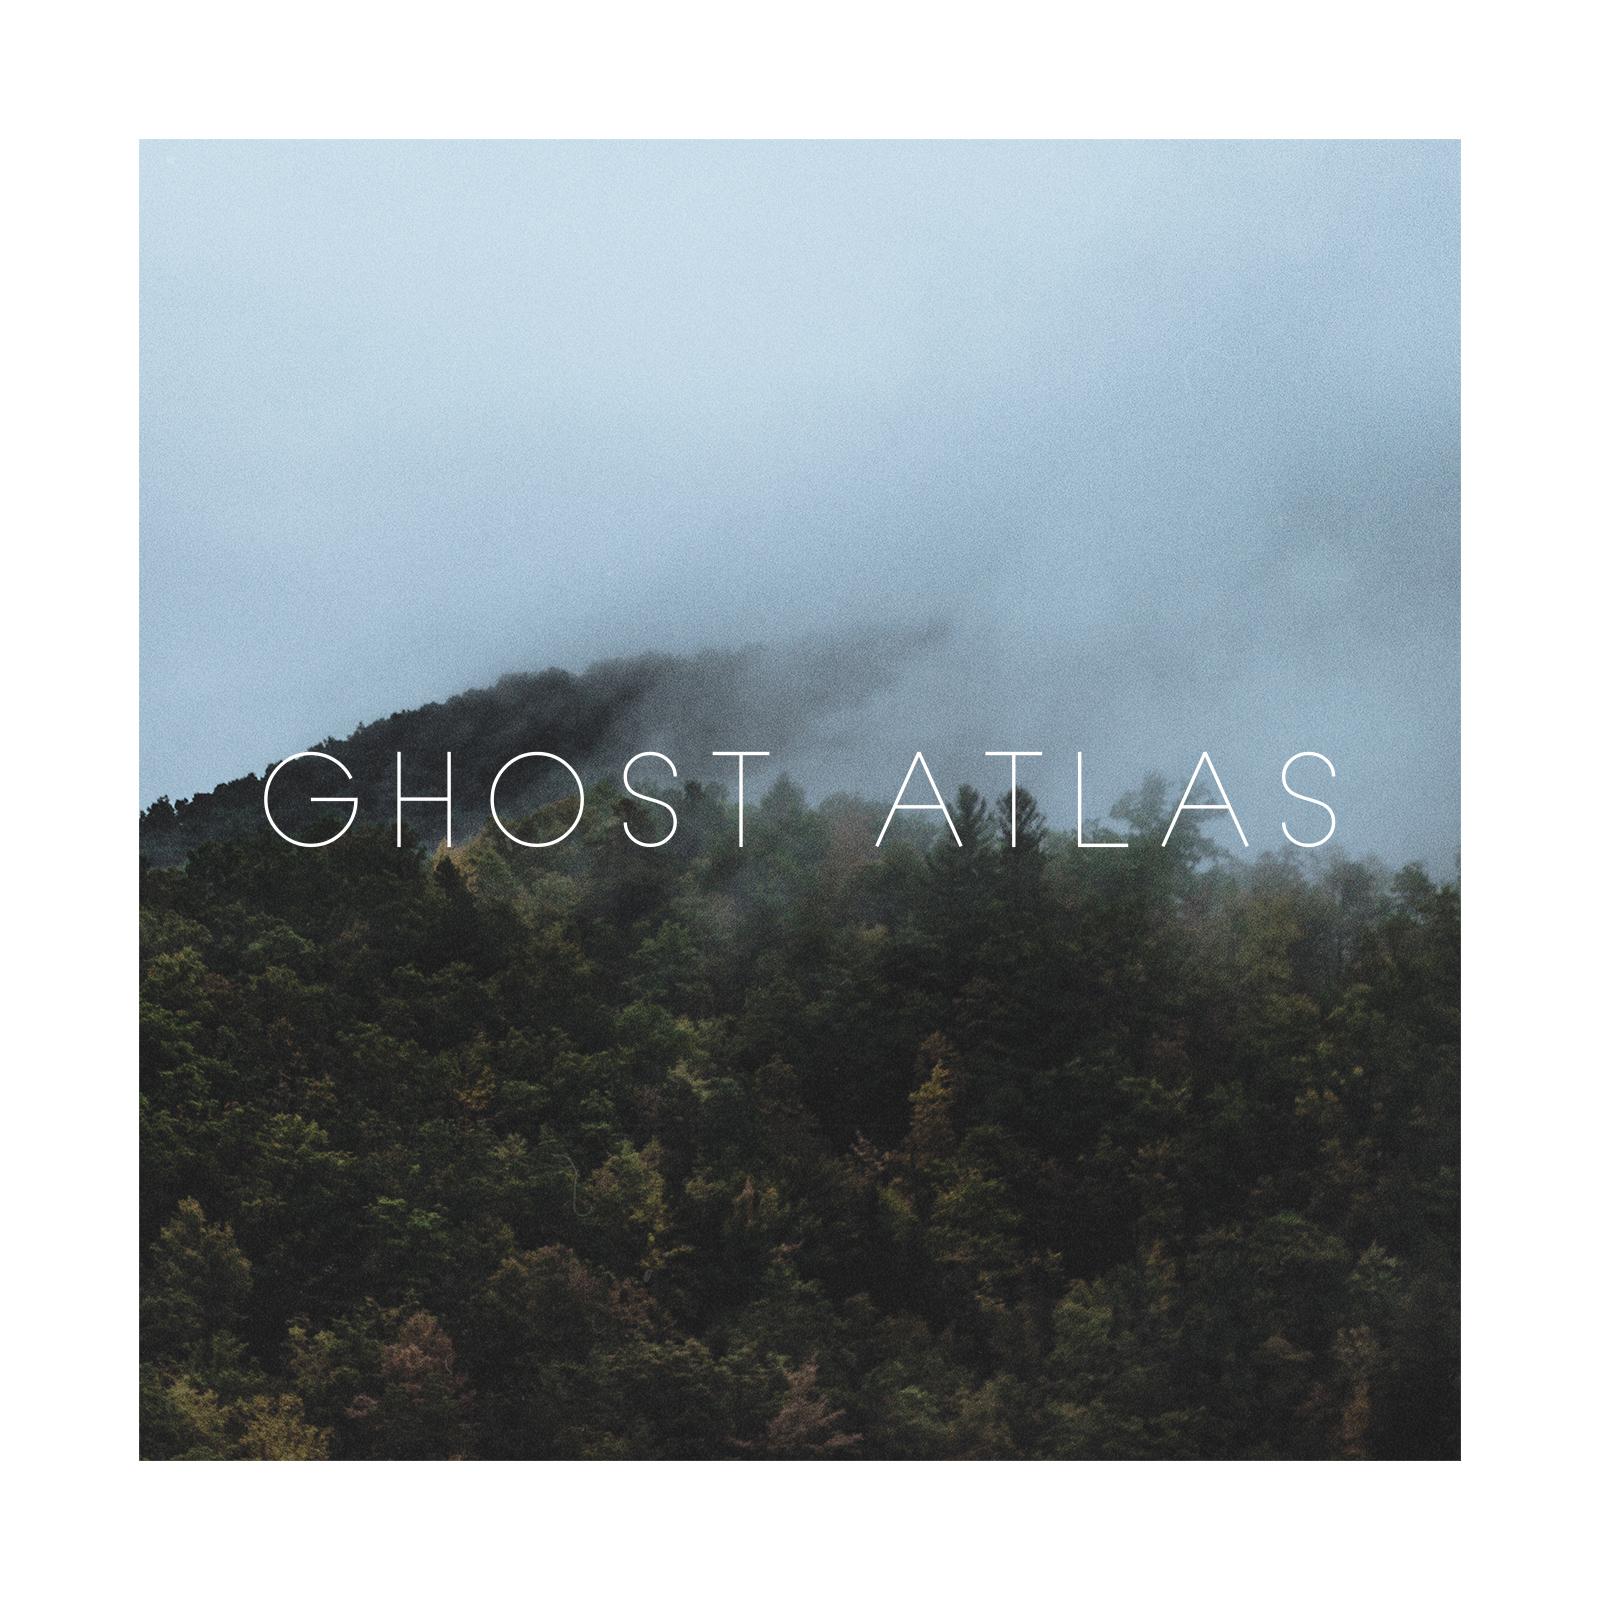 GHOST-ATLAS-FINAL-FINAL-COVER-1600x1600.jpg